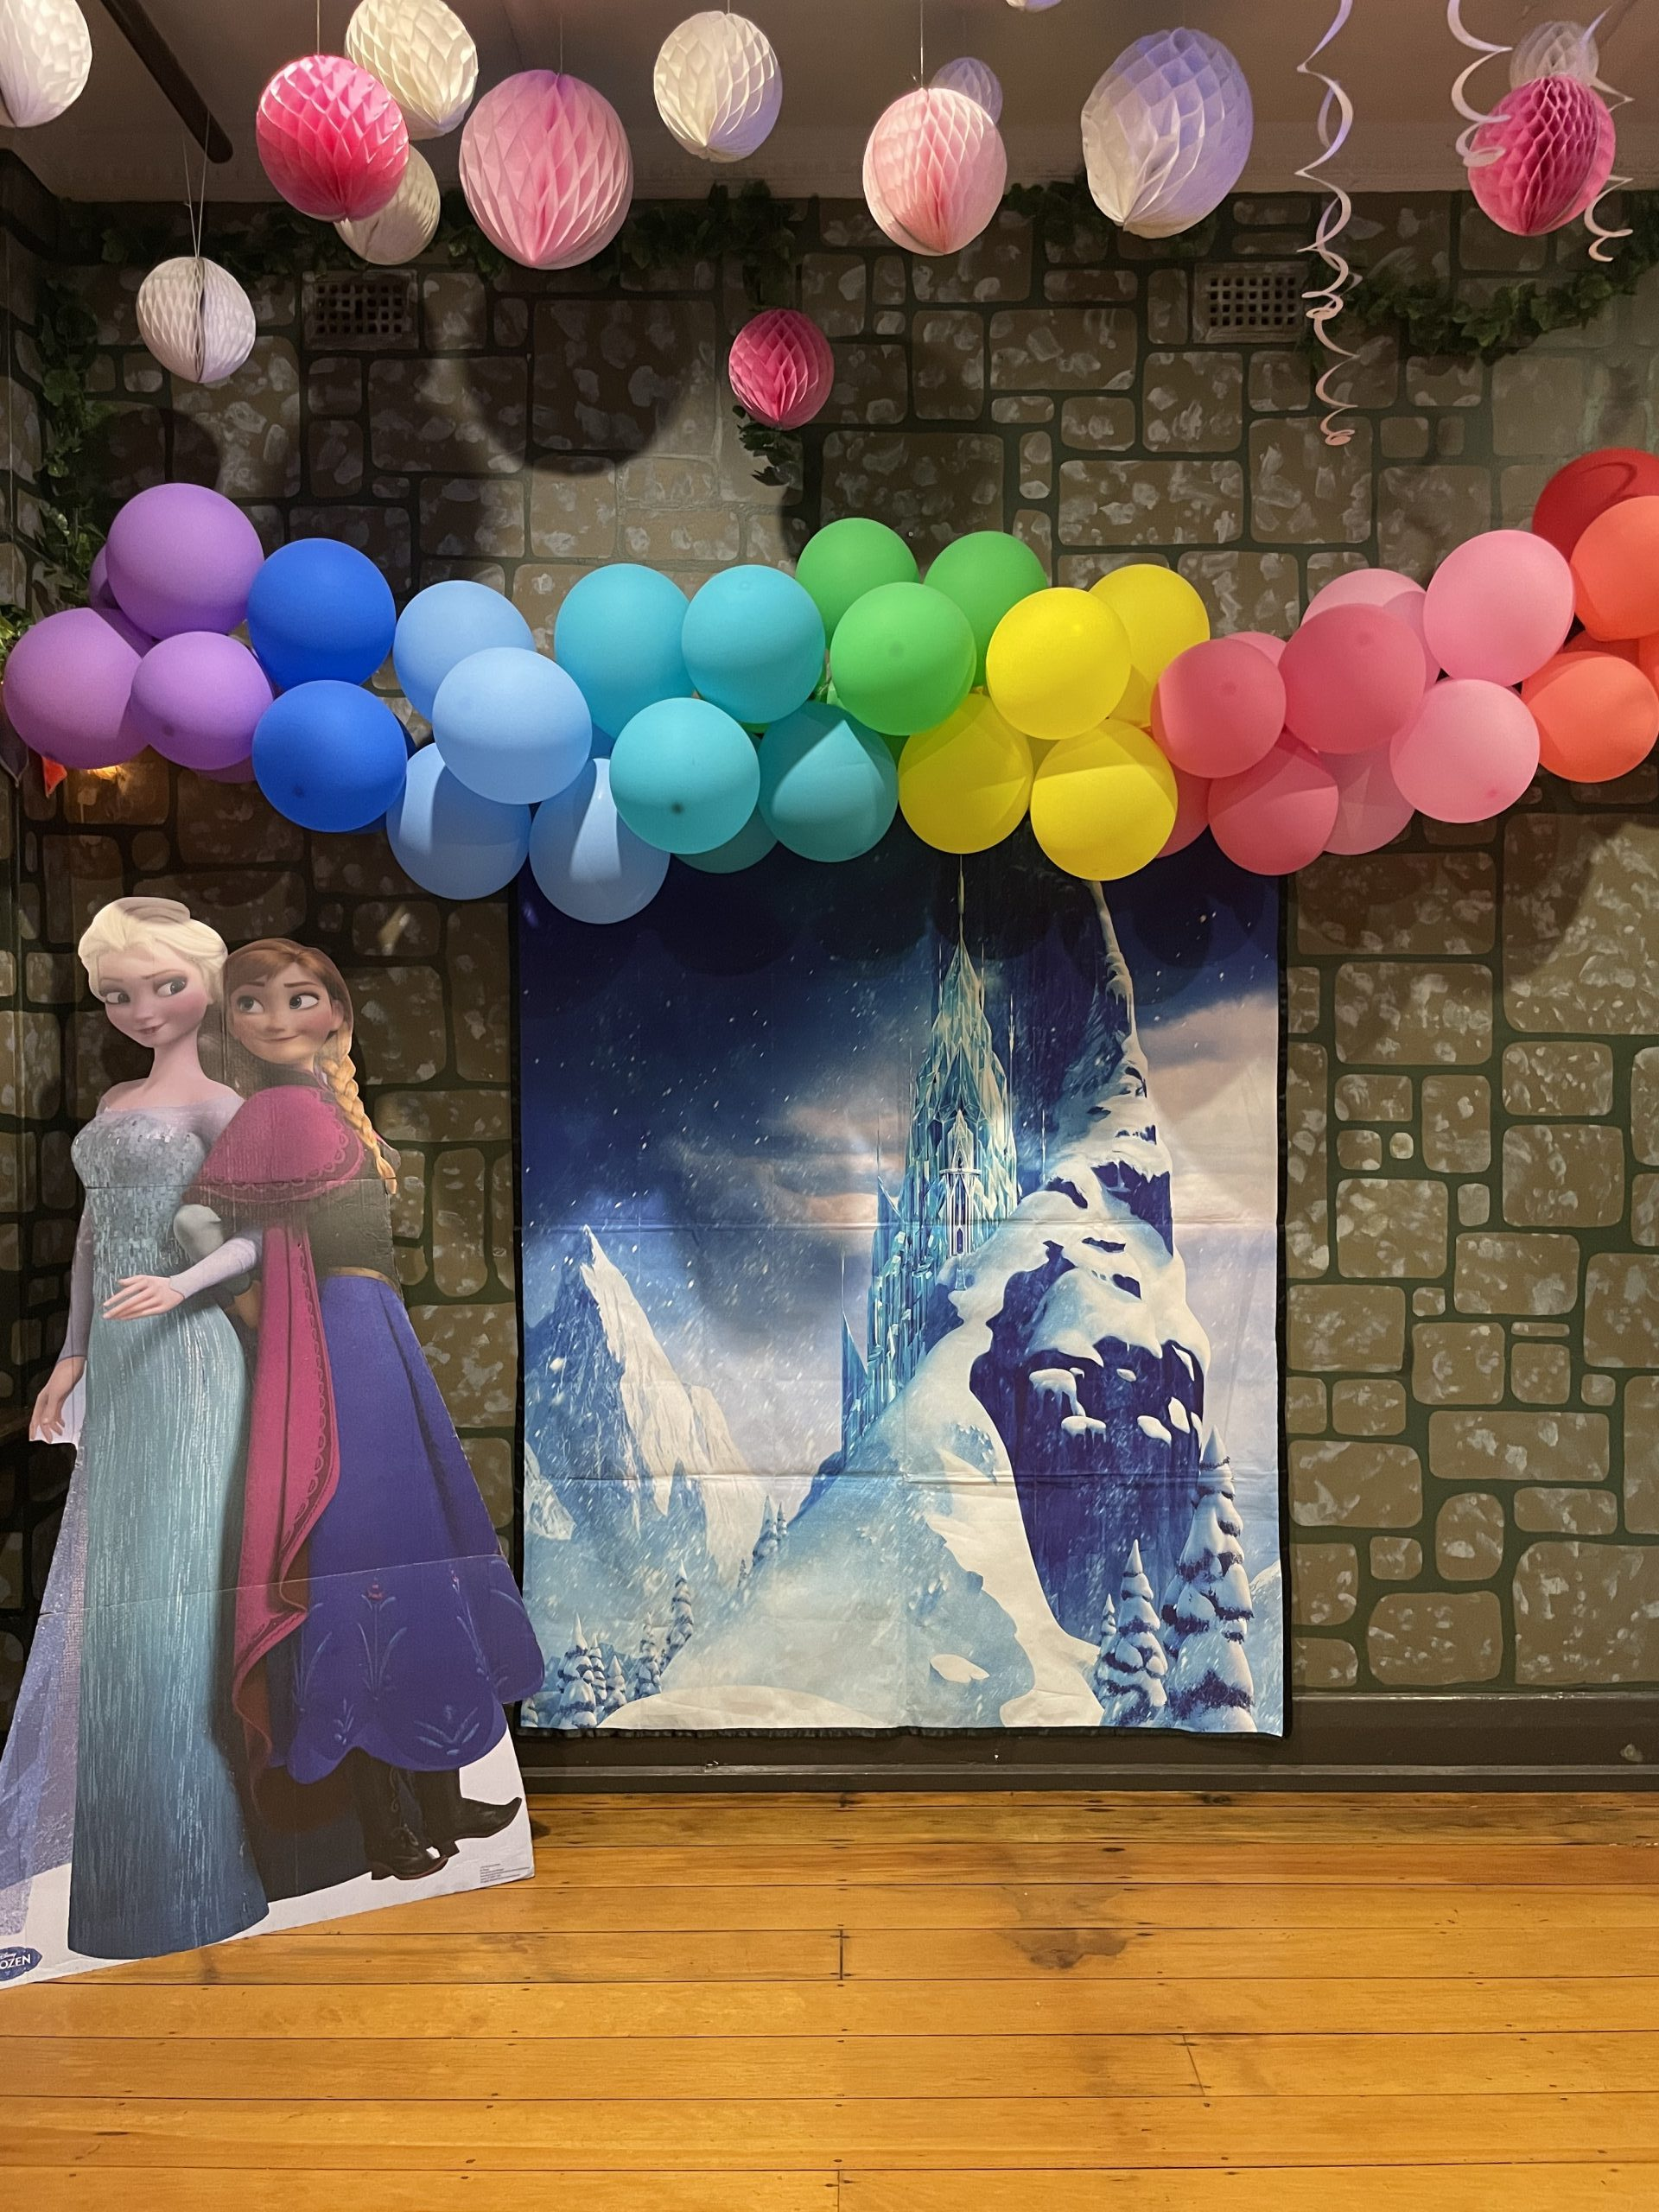 https://enchantedpalace.com.au/wp-content/uploads/2021/04/Frozen-scaled-e1619724726323.jpg